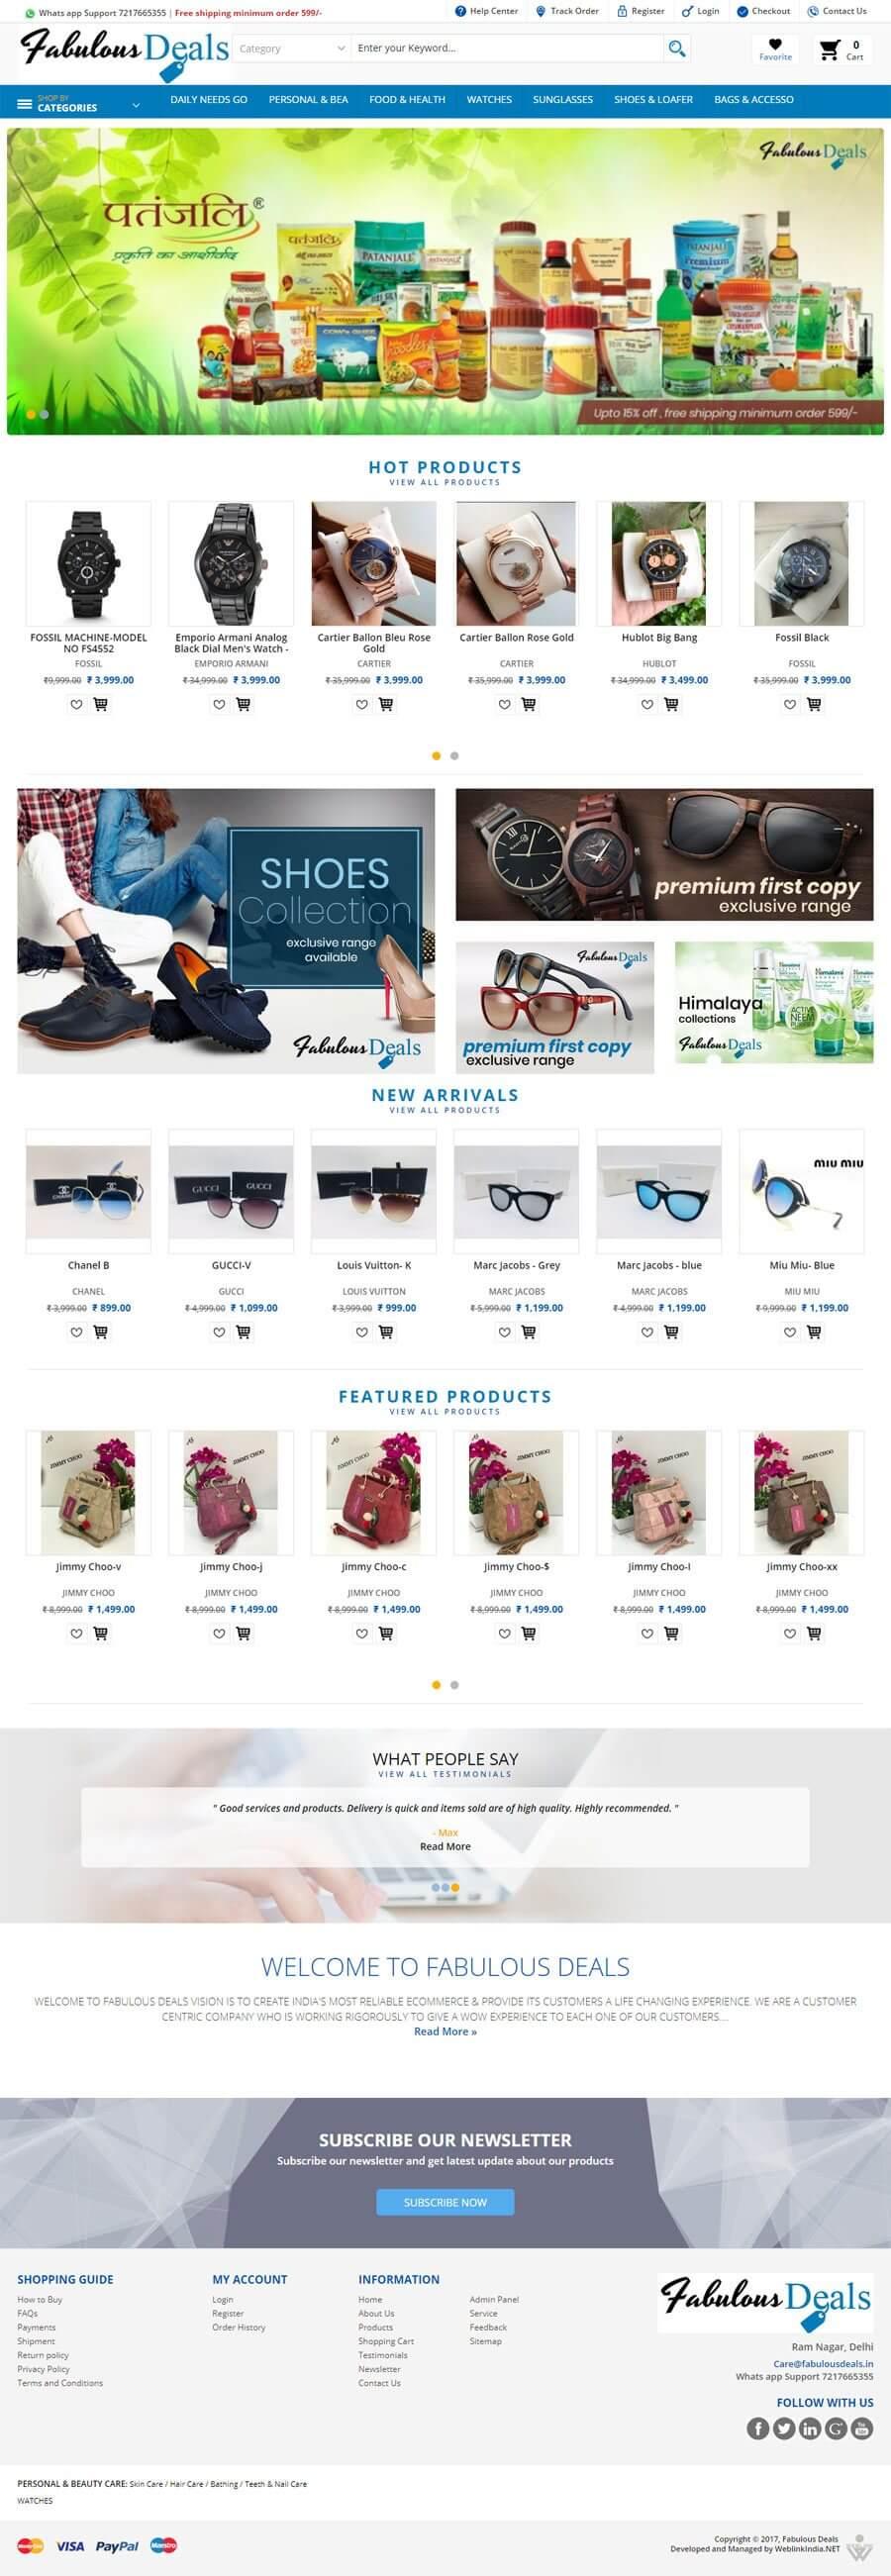 FABULOUS DEALS - Web Design Portfolio